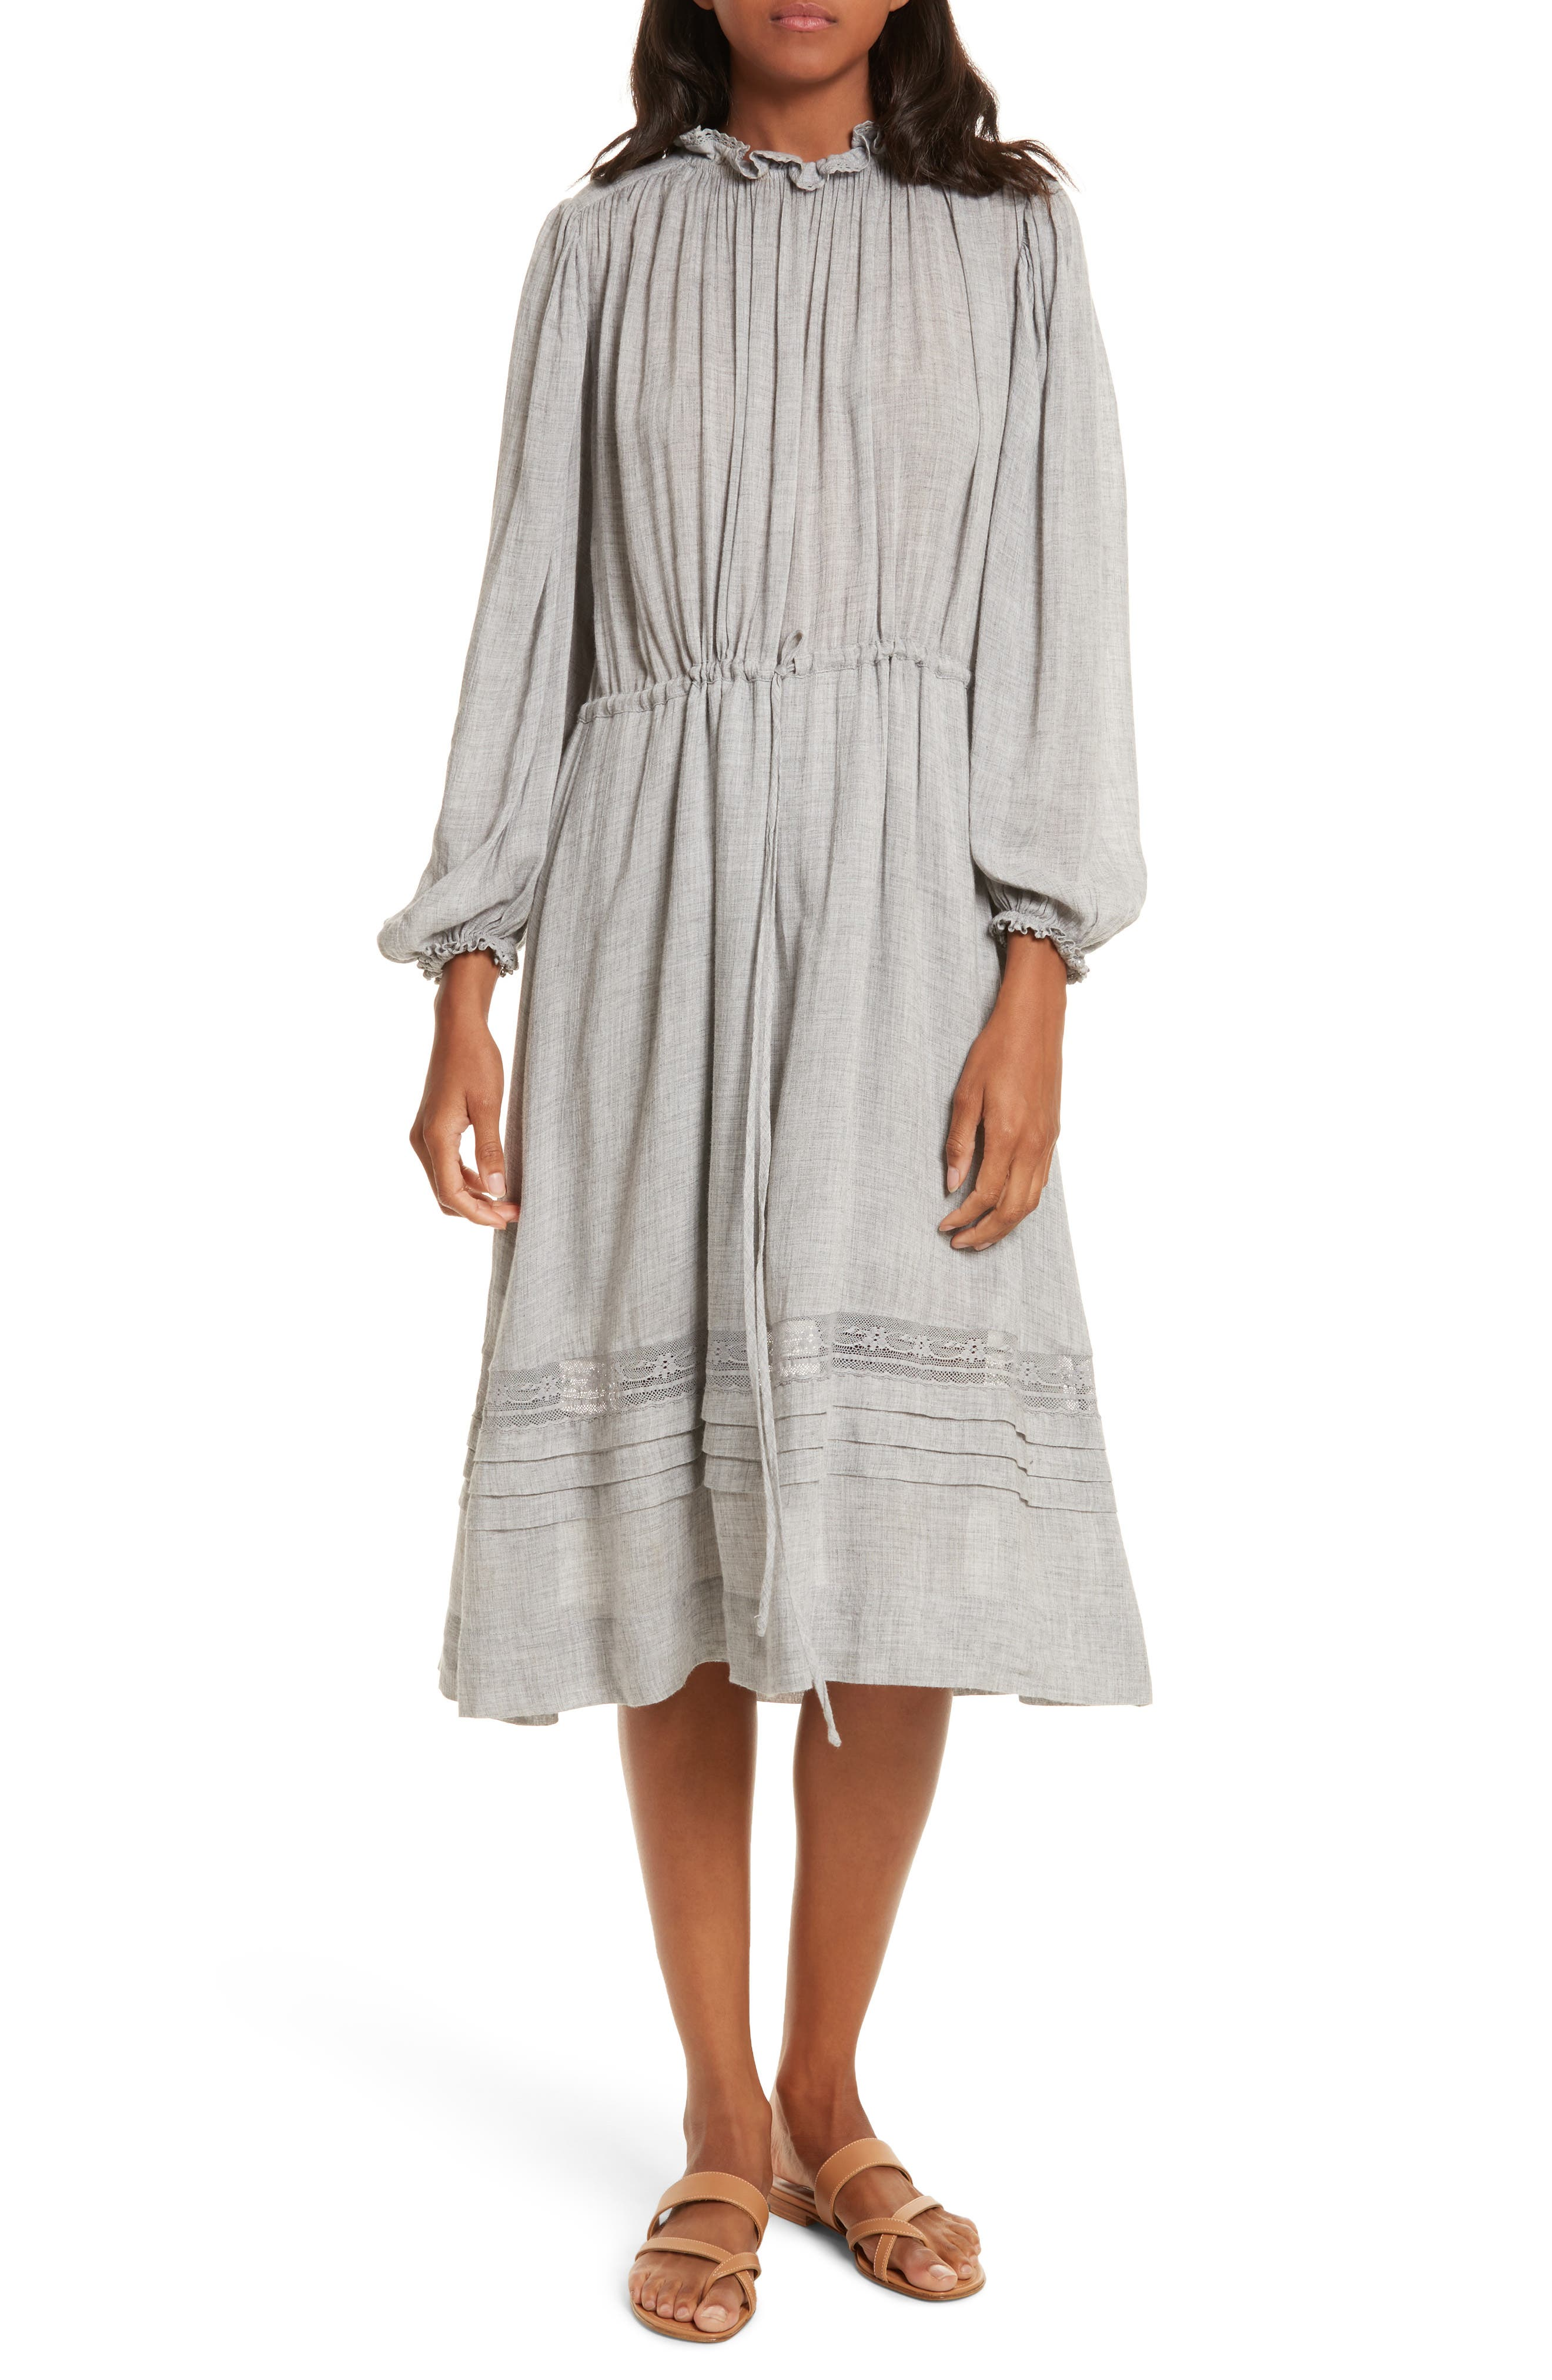 Alternate Image 1 Selected - Rebecca Taylor Lace Trim Gauze Drawstring Midi Dress